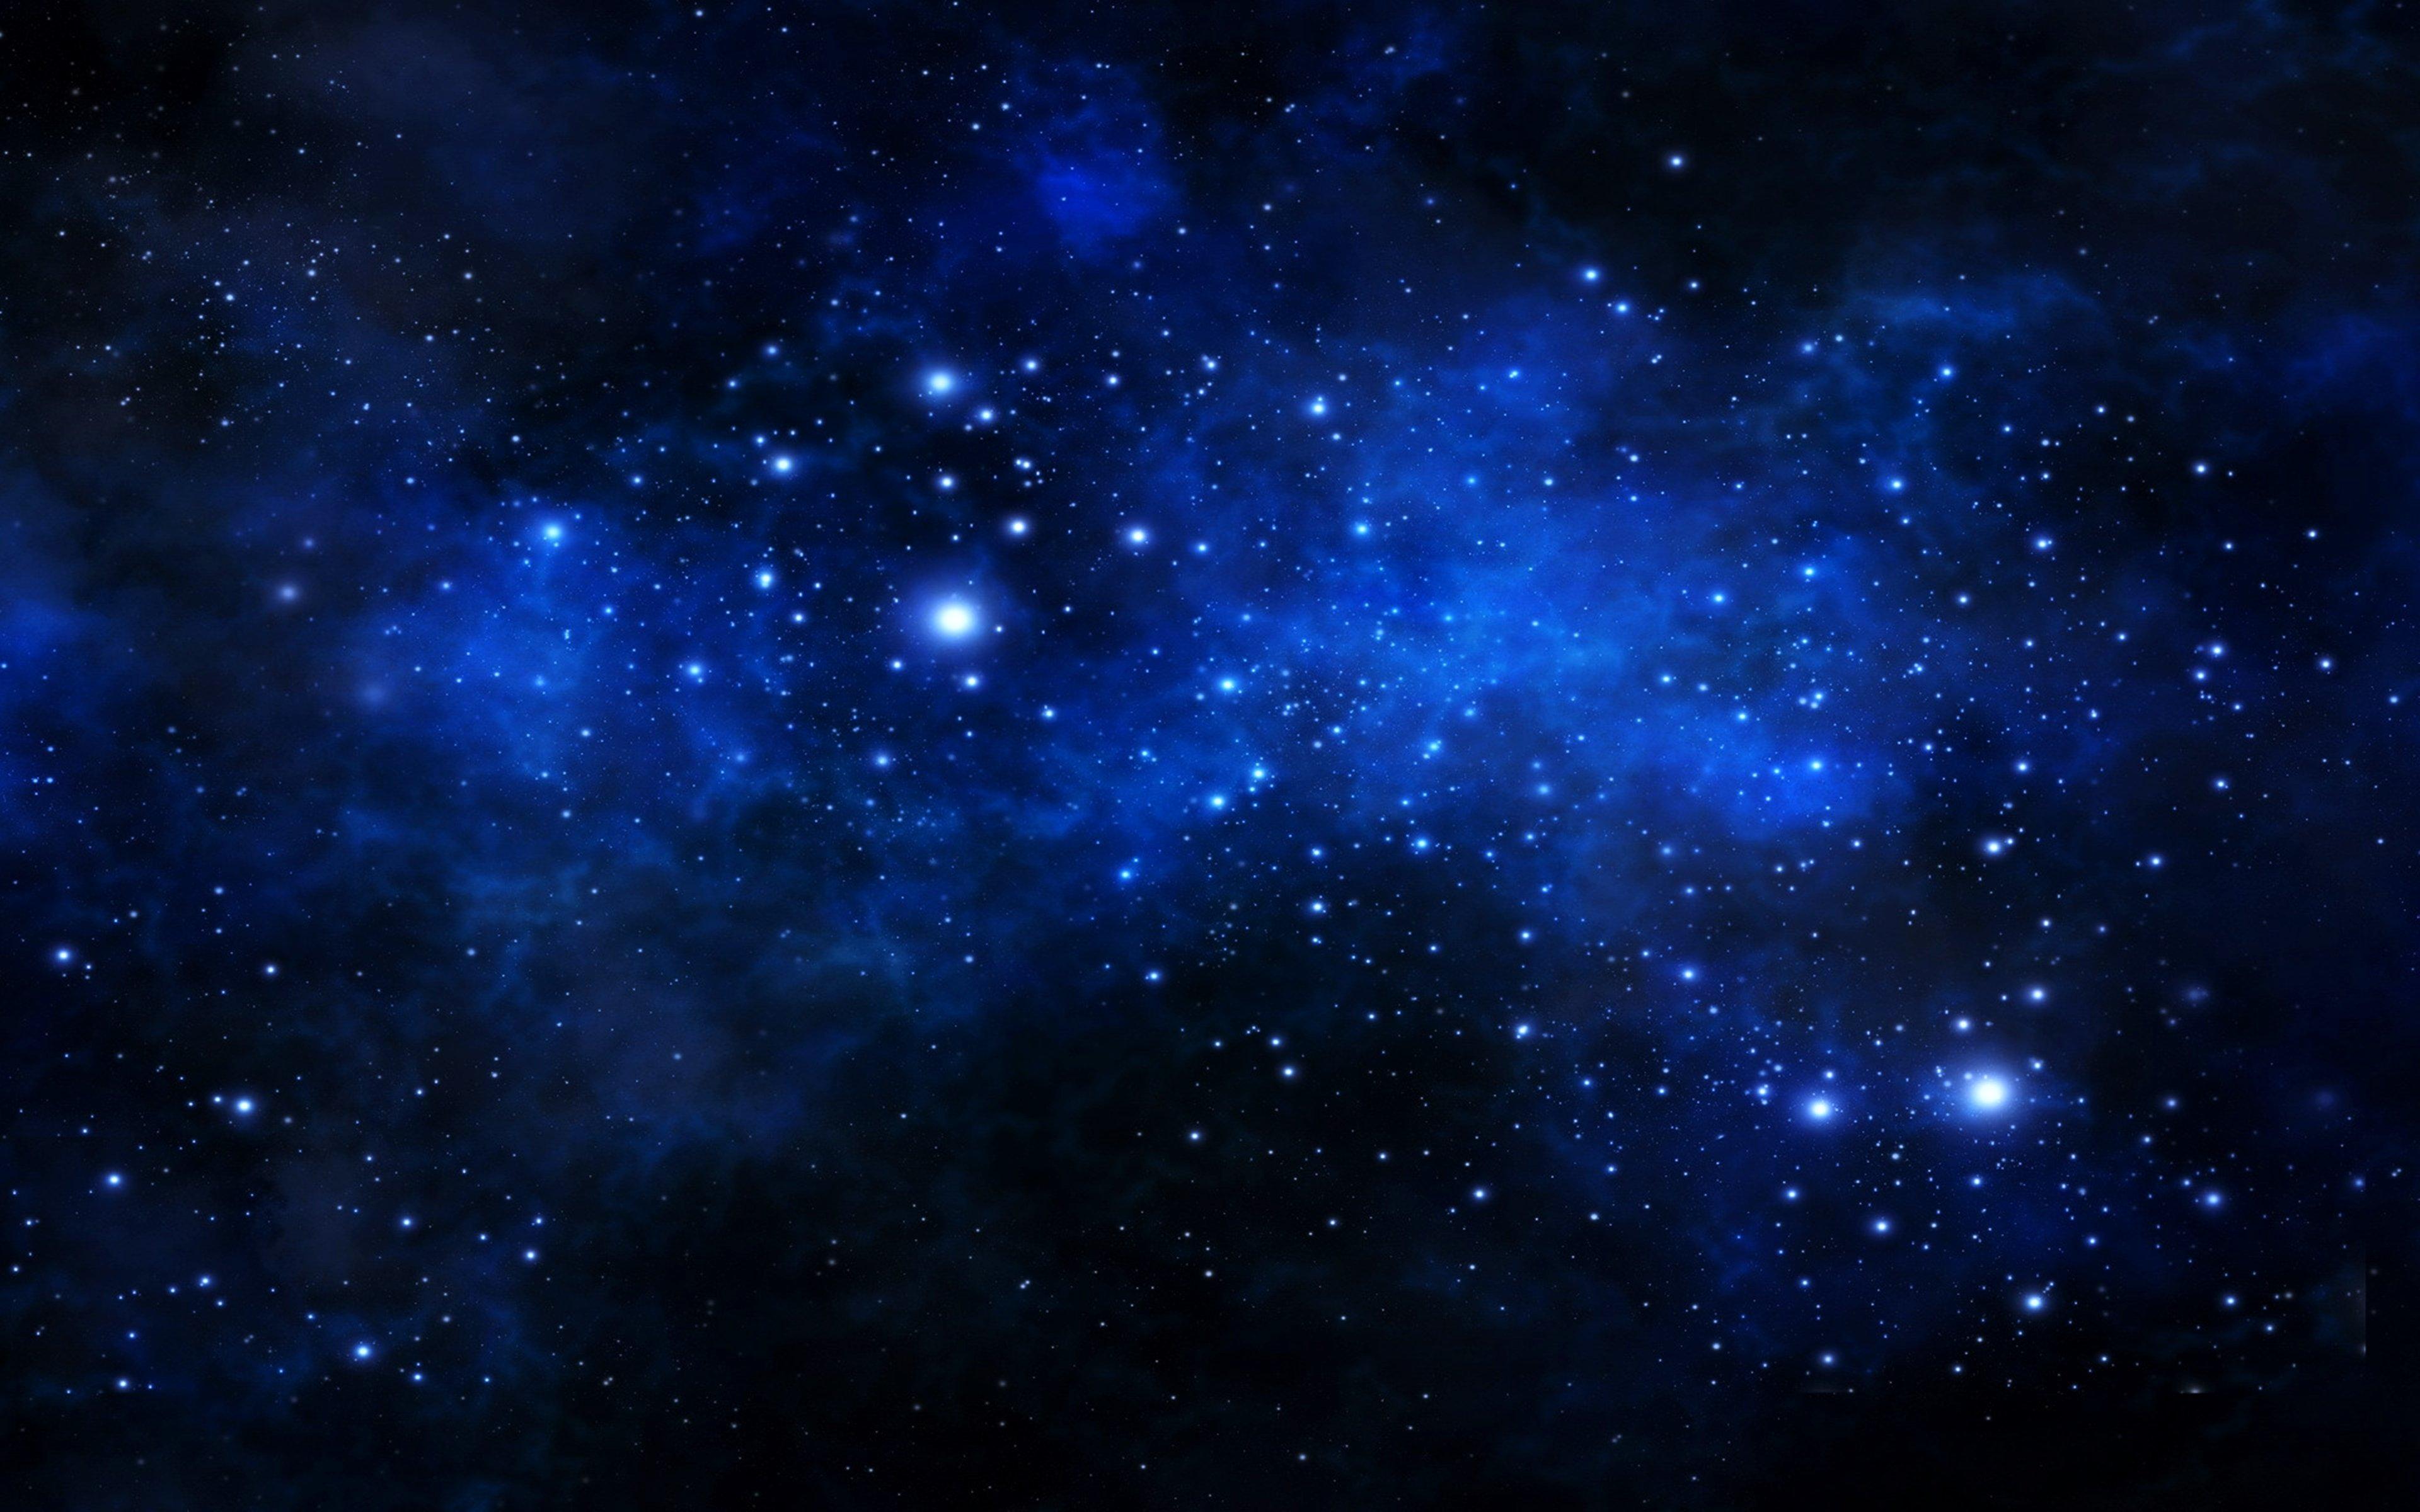 3840x2400 px blue colors galaxy glow nebula pink planets sky space stars UFO universe 1735025